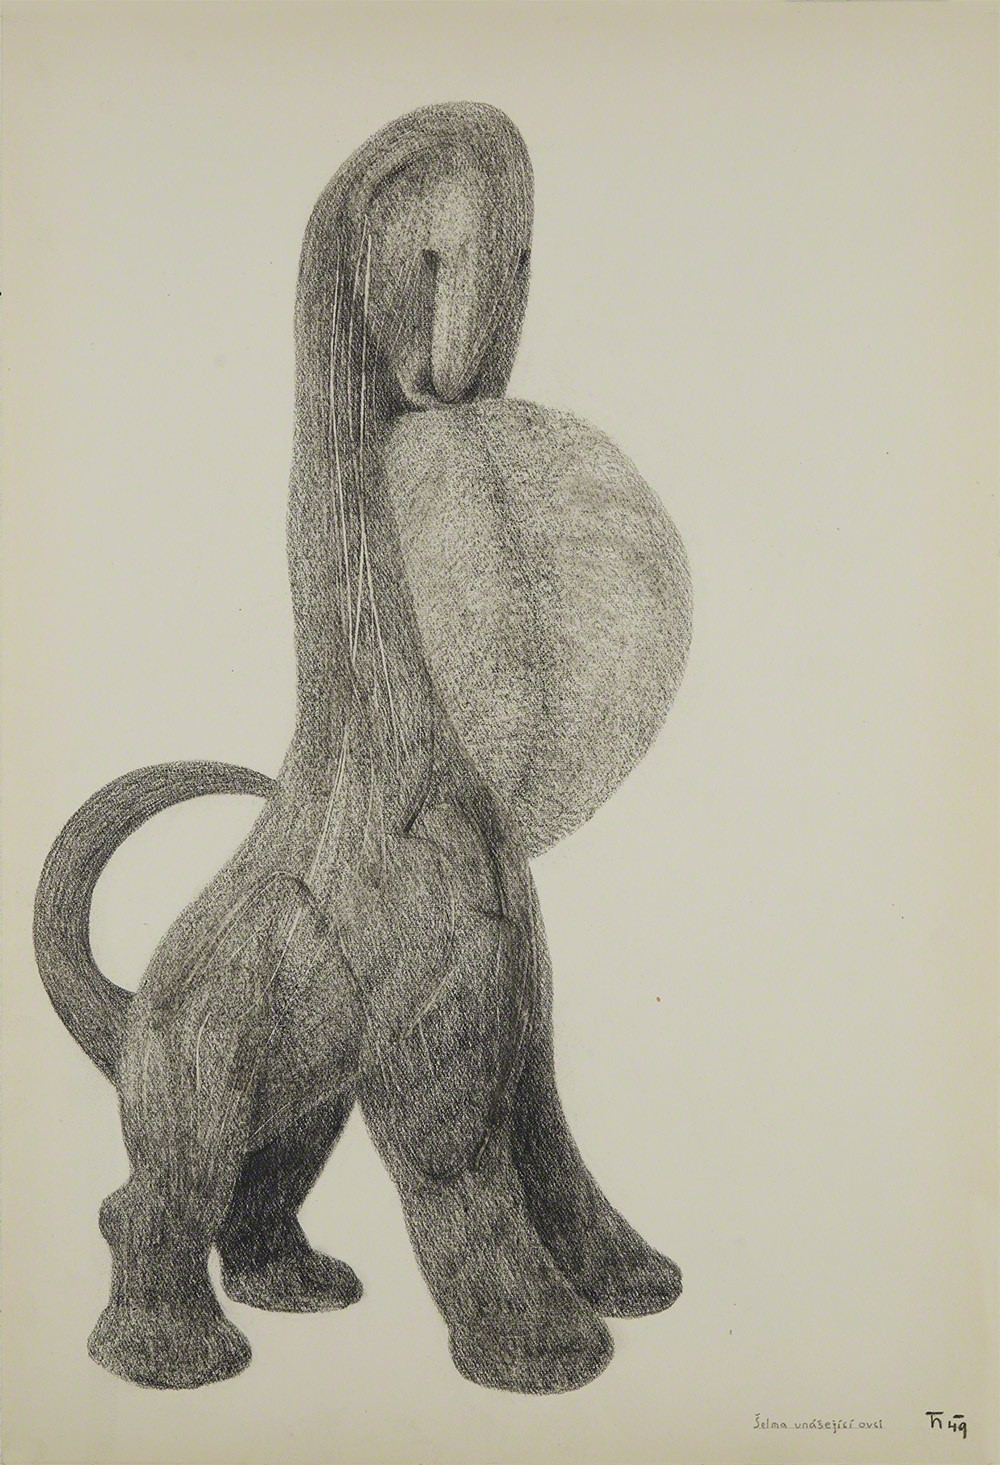 Karel Havlicek - Untitled, 1949